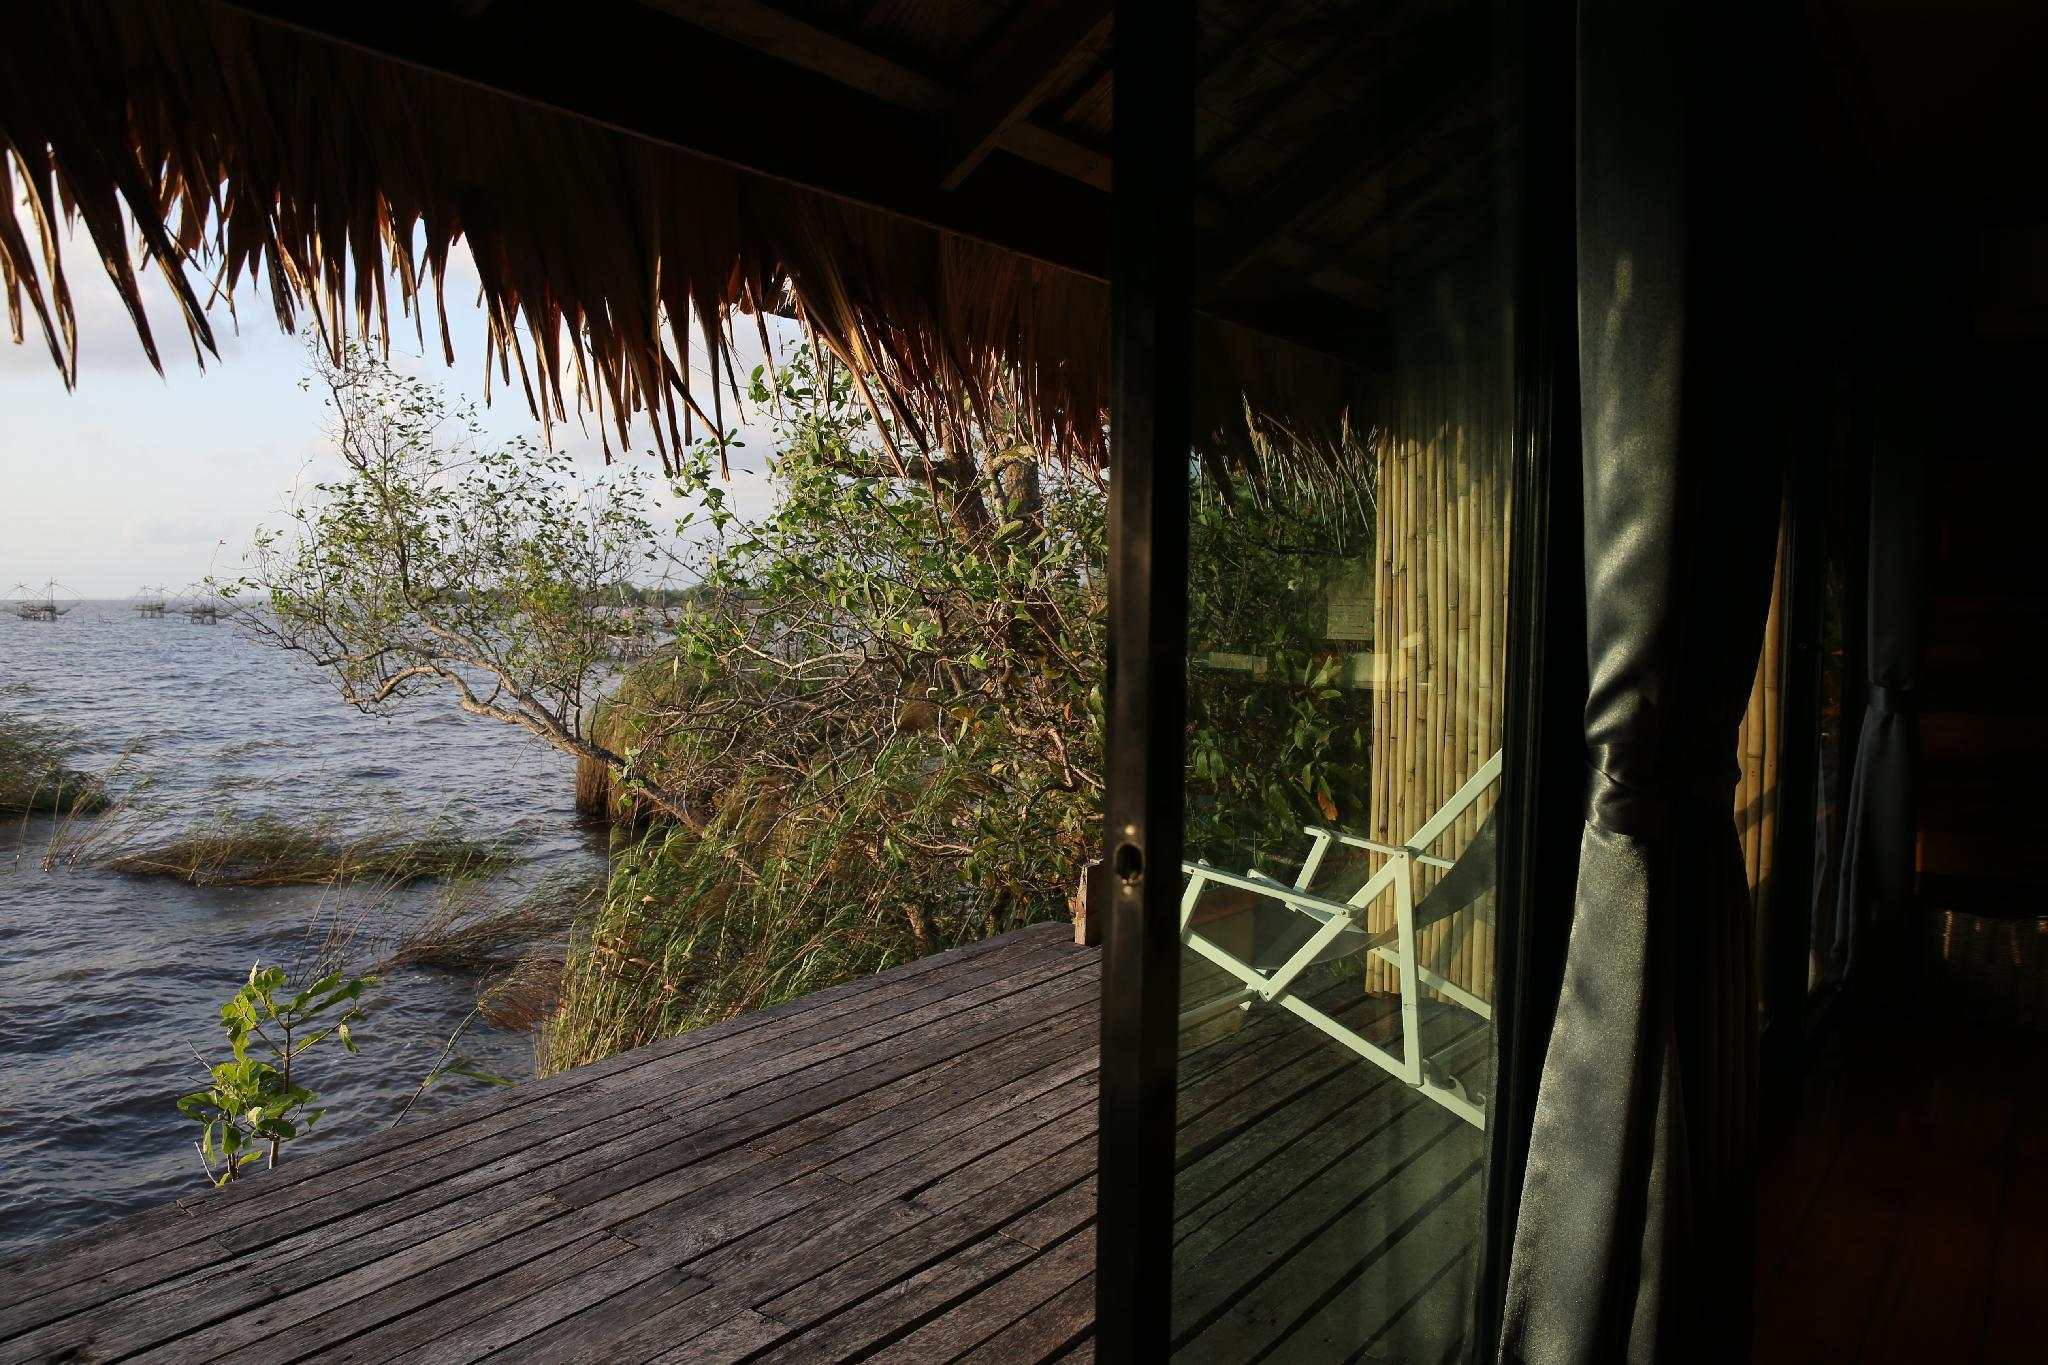 wetlandcamp baanchailay Villa 3 สตูดิโอ บังกะโล 1 ห้องน้ำส่วนตัว ขนาด 24 ตร.ม. – ควนขนุน